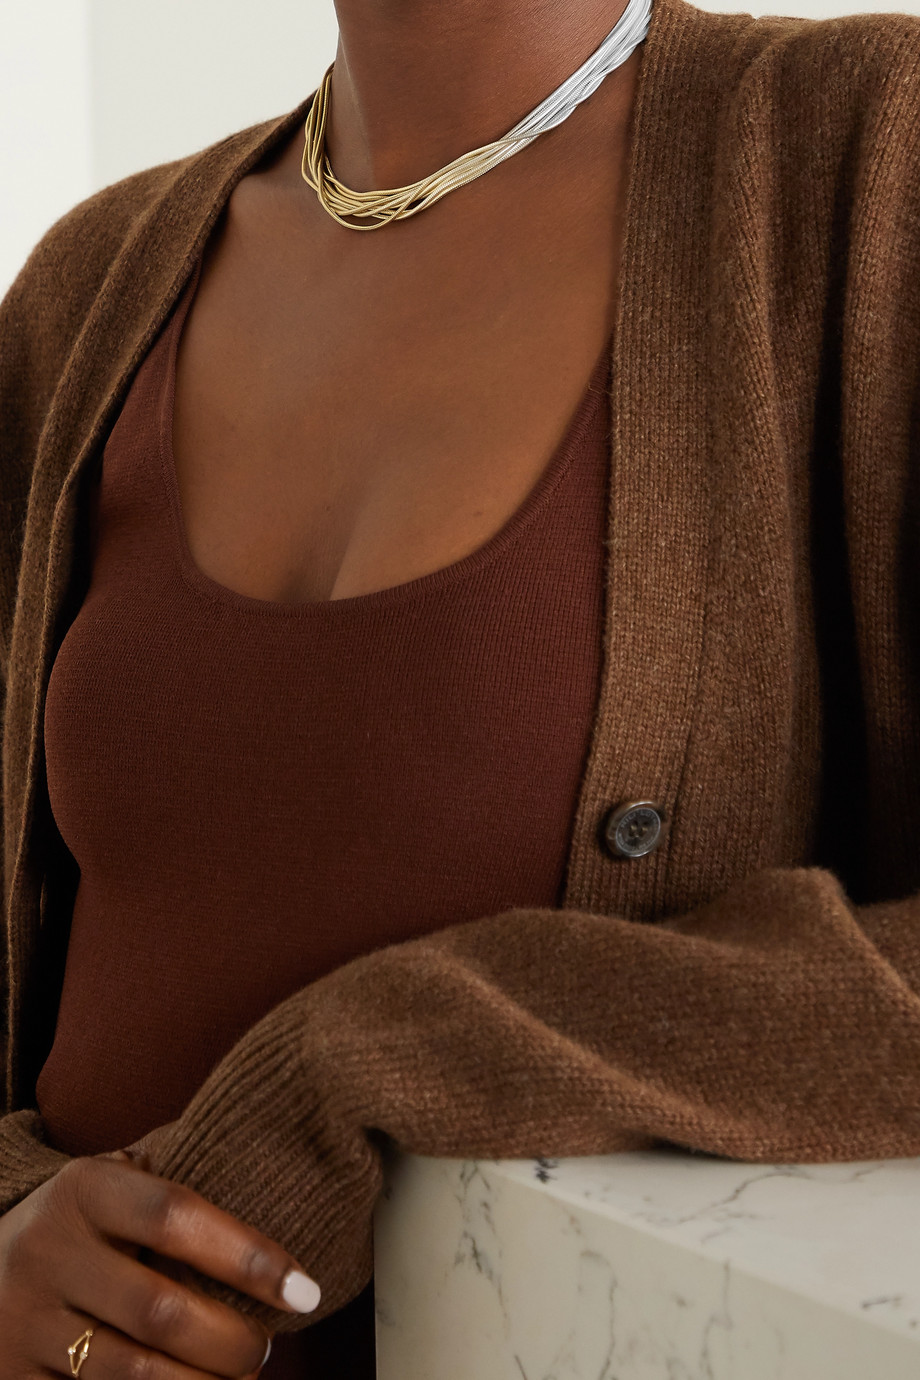 SARAH & SEBASTIAN Feeler gold vermeil and silver necklace